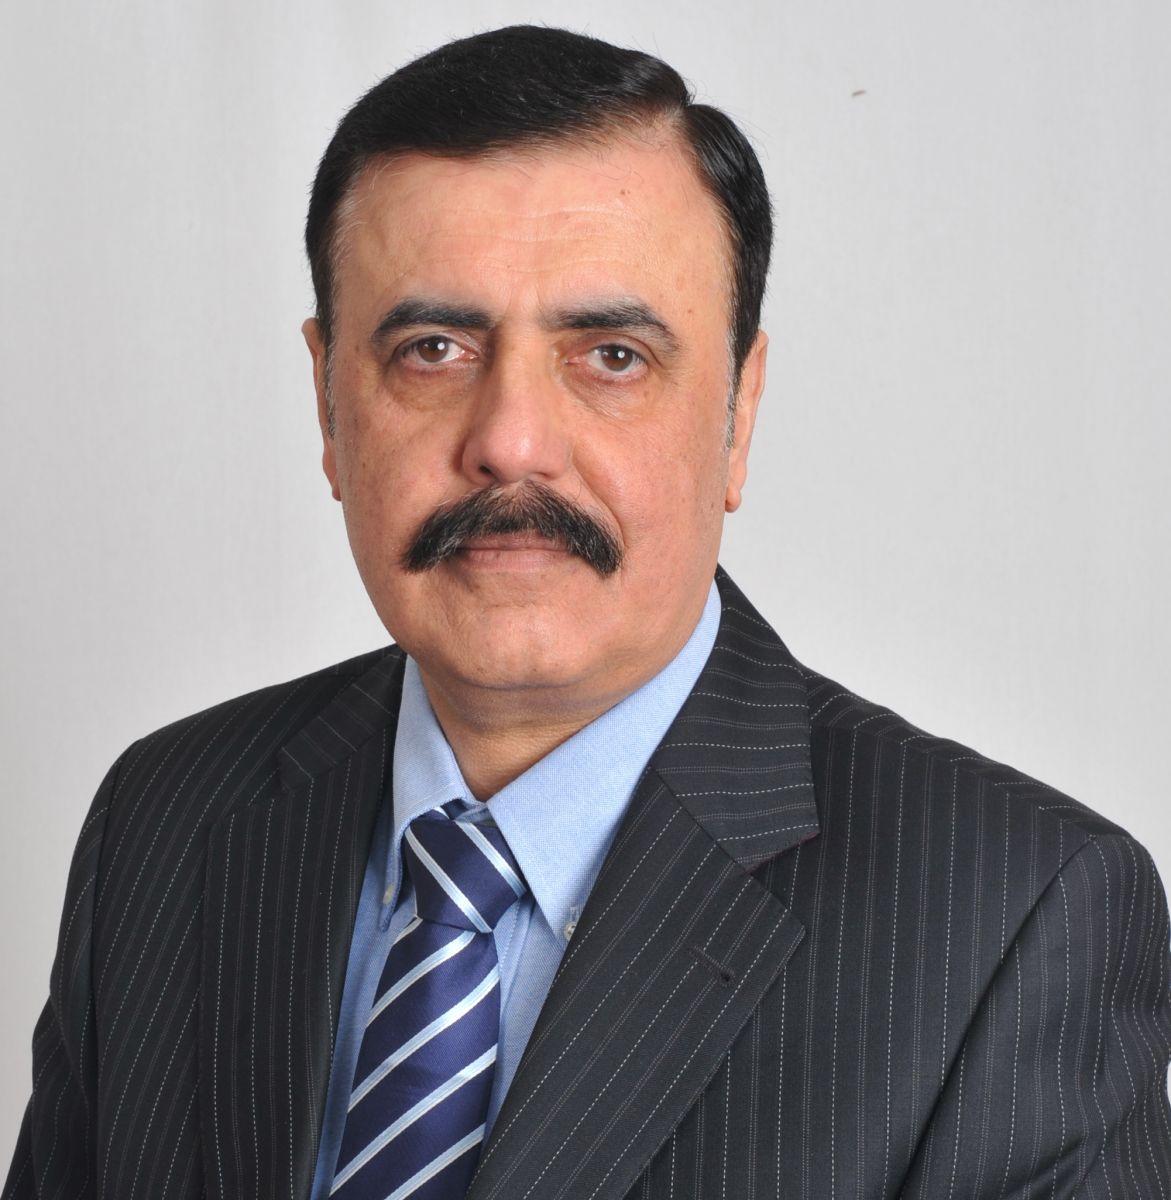 Anil Vohra - Consultant Urological Surgeon